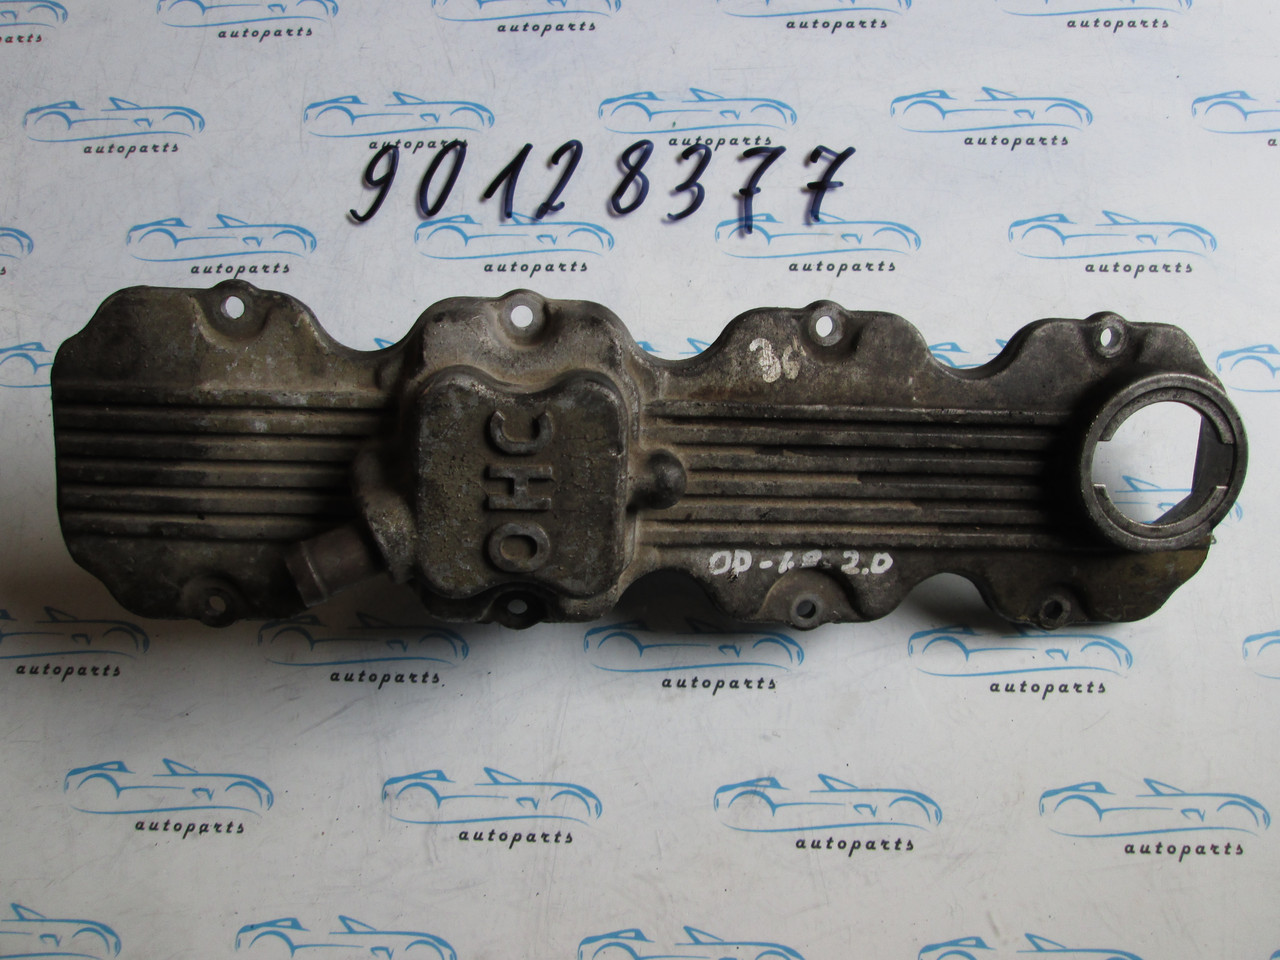 Клапанная крышка Opel 1.7D 8V, 90128377